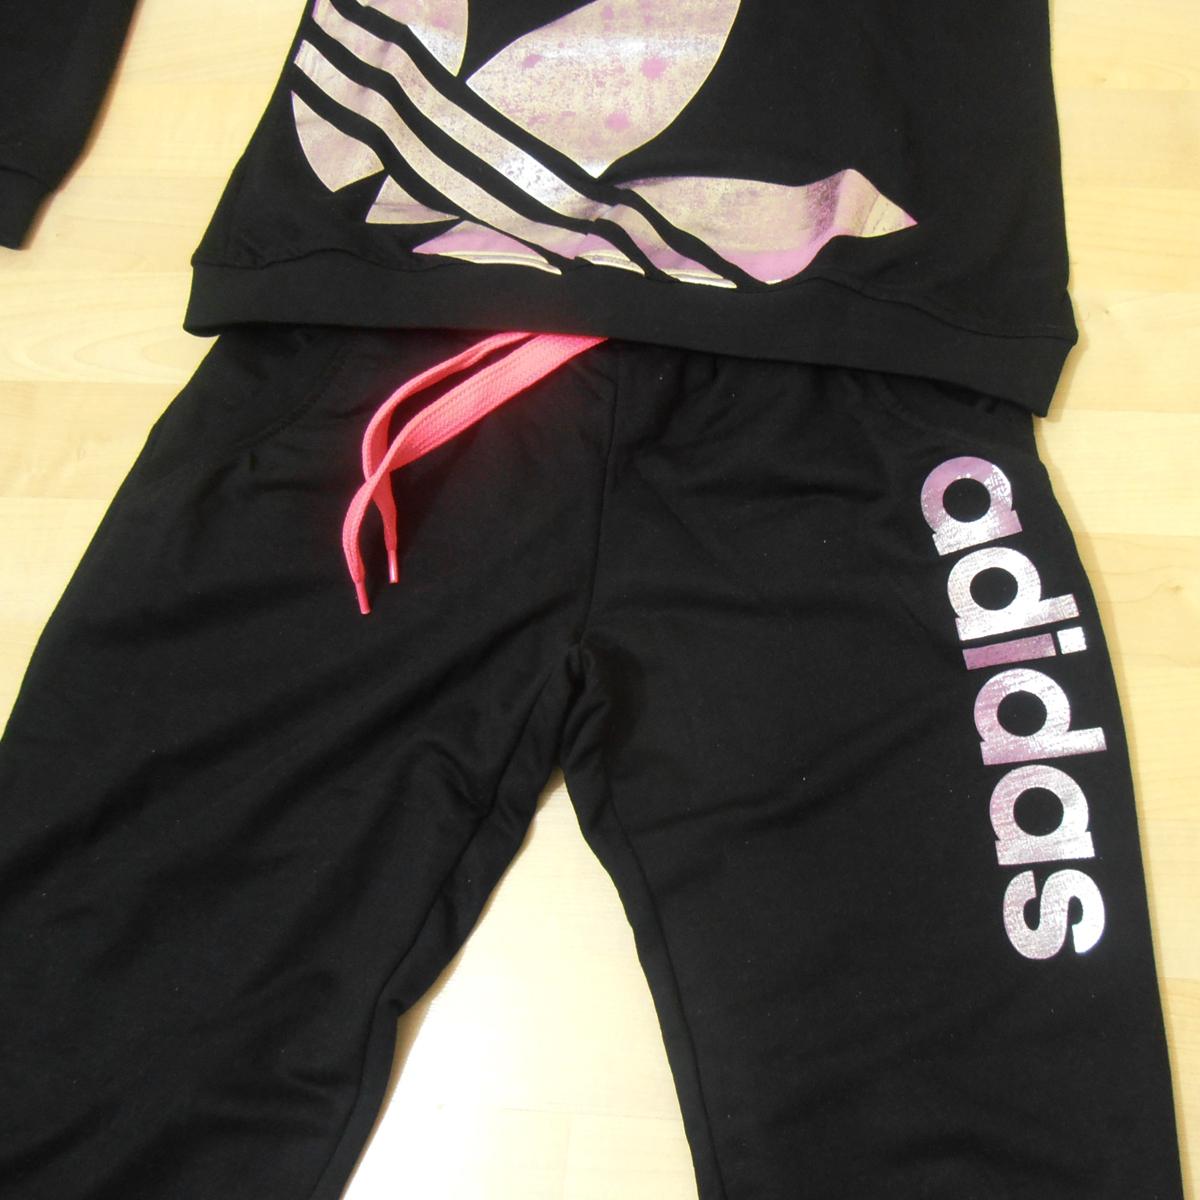 Adidas Neon Color Women Tracksuit Sweatsuit Black - Athletic Apparel